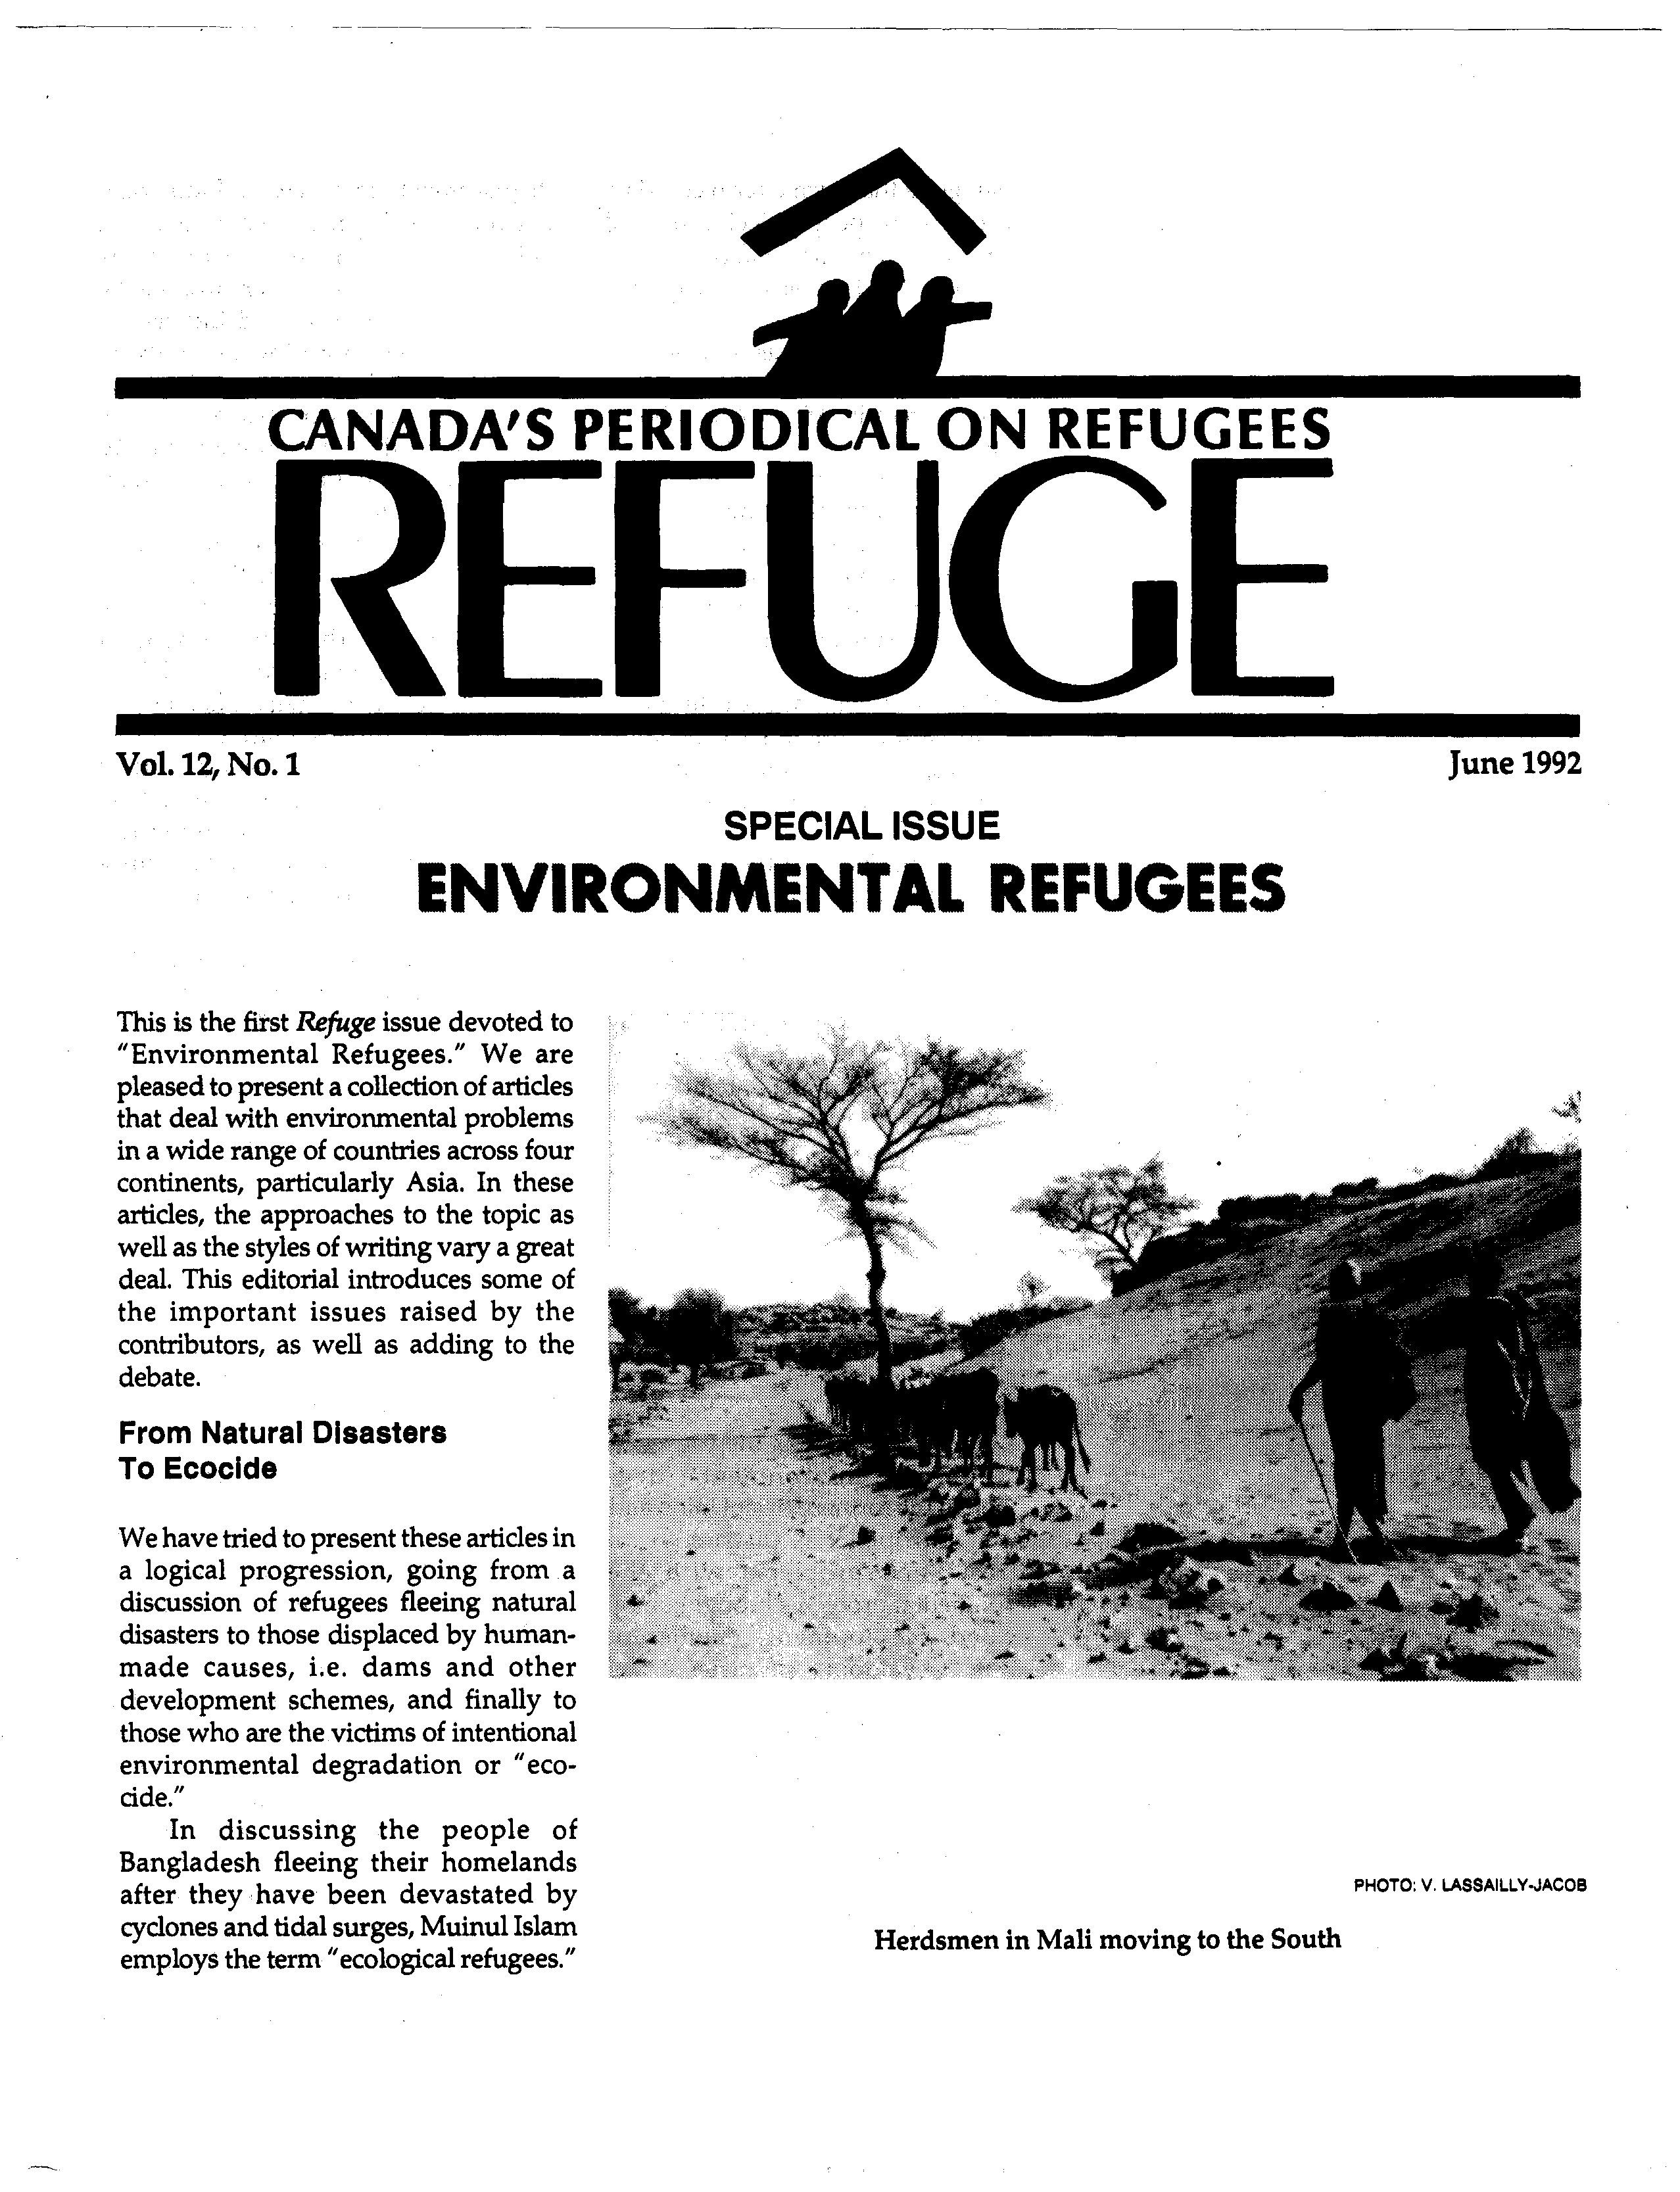 first page Refuge vol. 12.1 1992